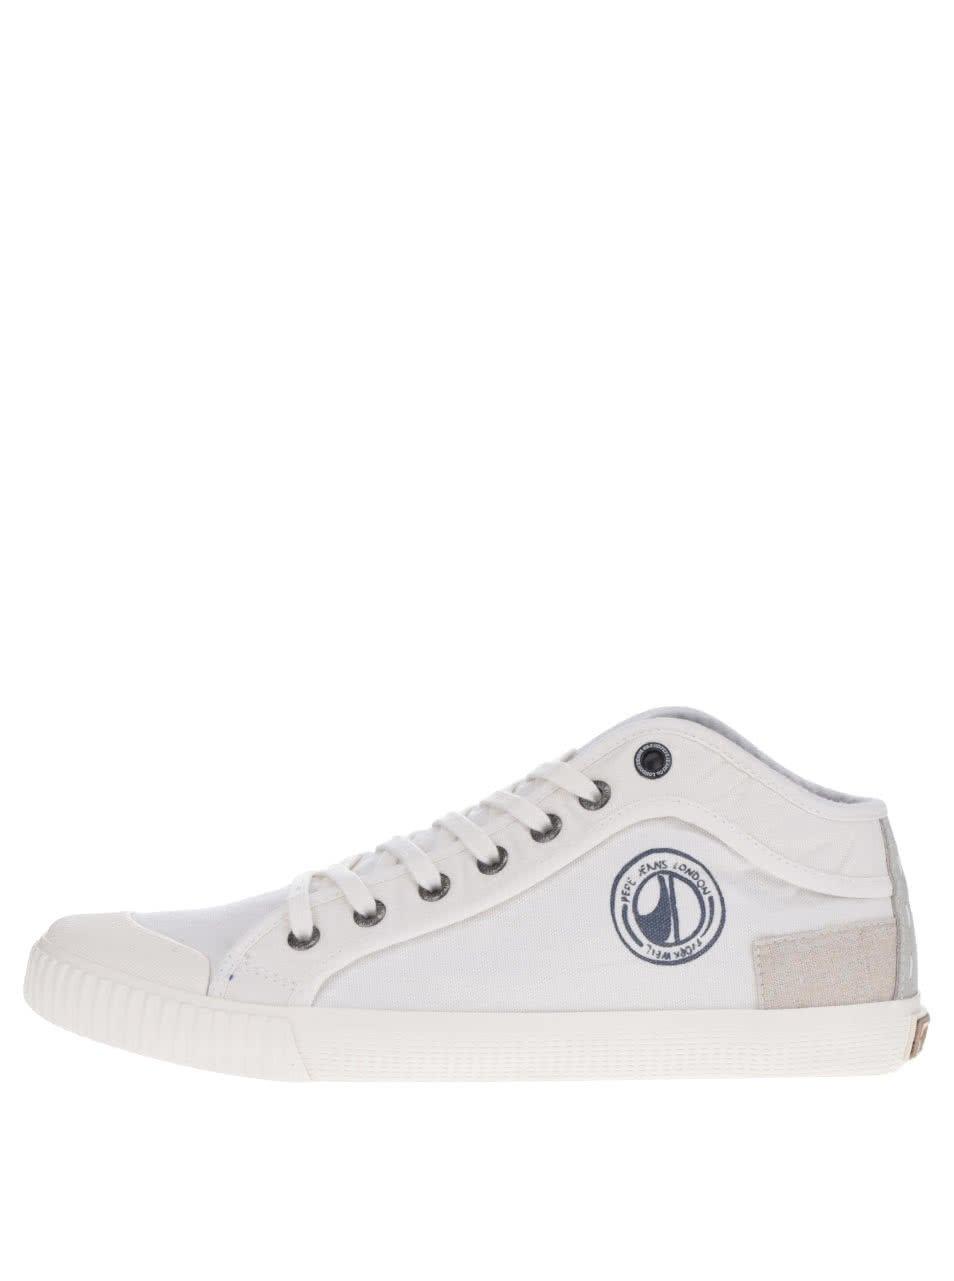 Bílé pánské tenisky s logem Pepe Jeans Industry Tenugui